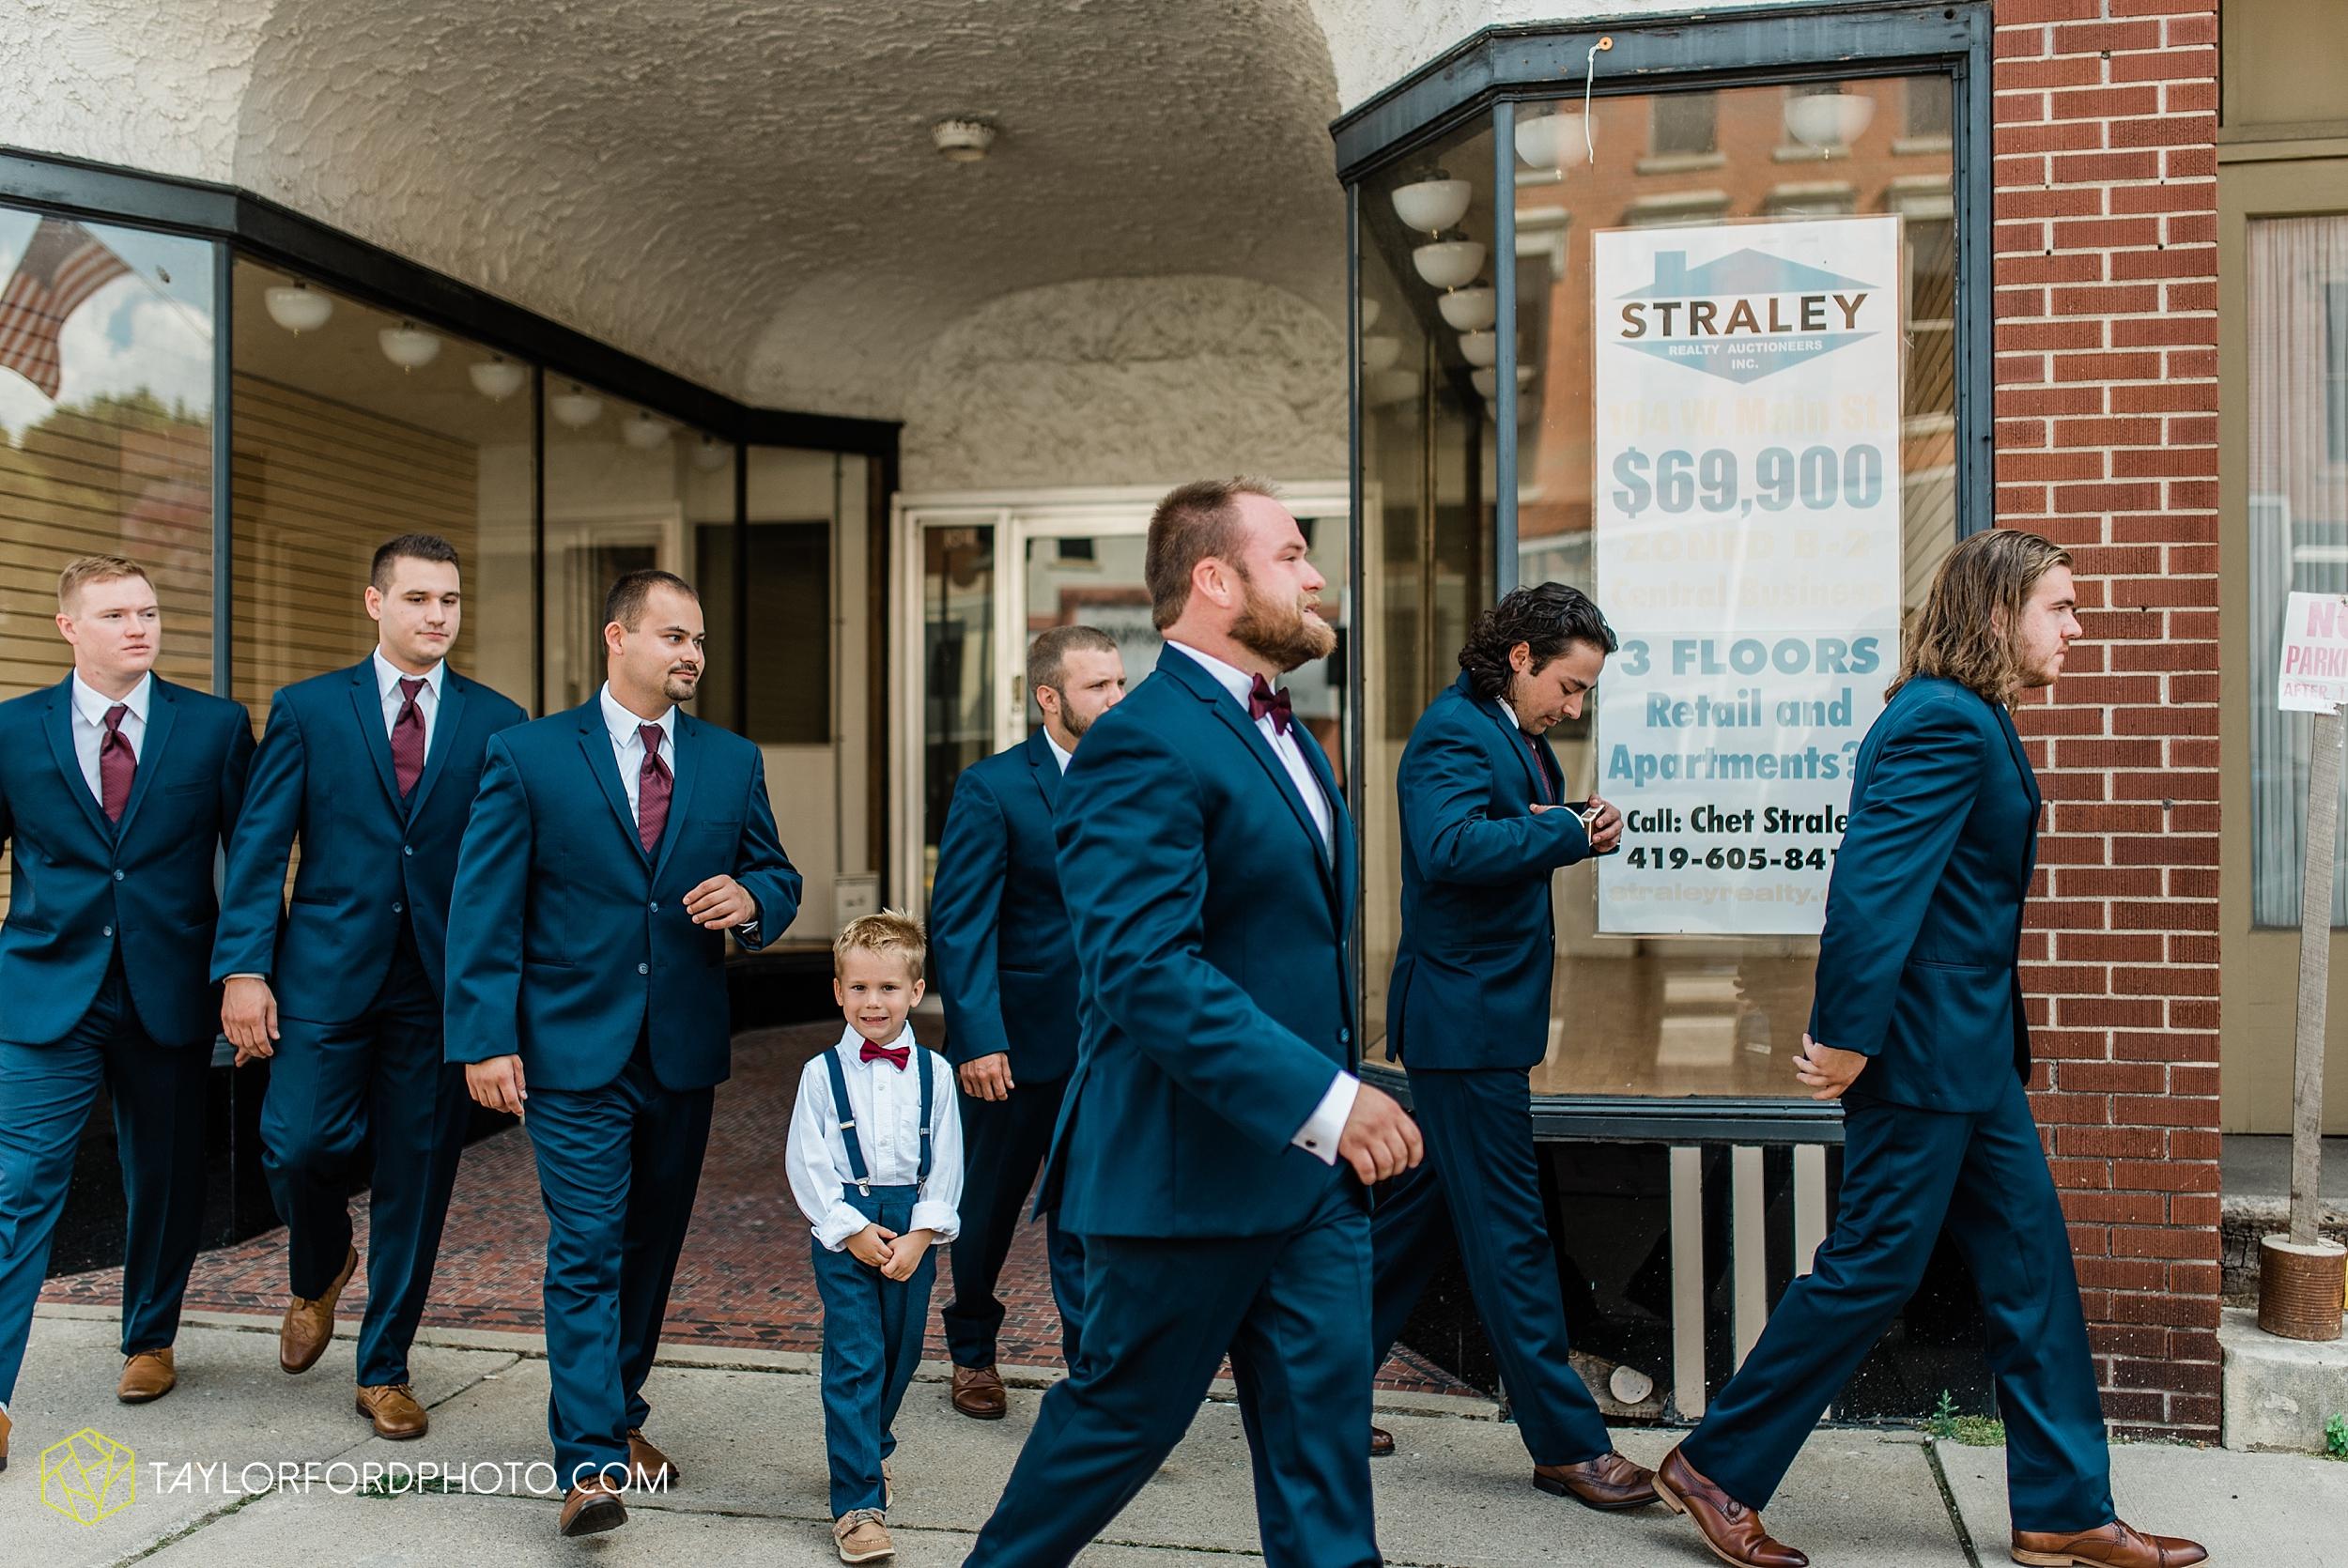 chelsey-zosh-jackson-young-first-united-methodist-church-senior-center-van-wert-ohio-wedding-photographer-taylor-ford-photography_0064.jpg